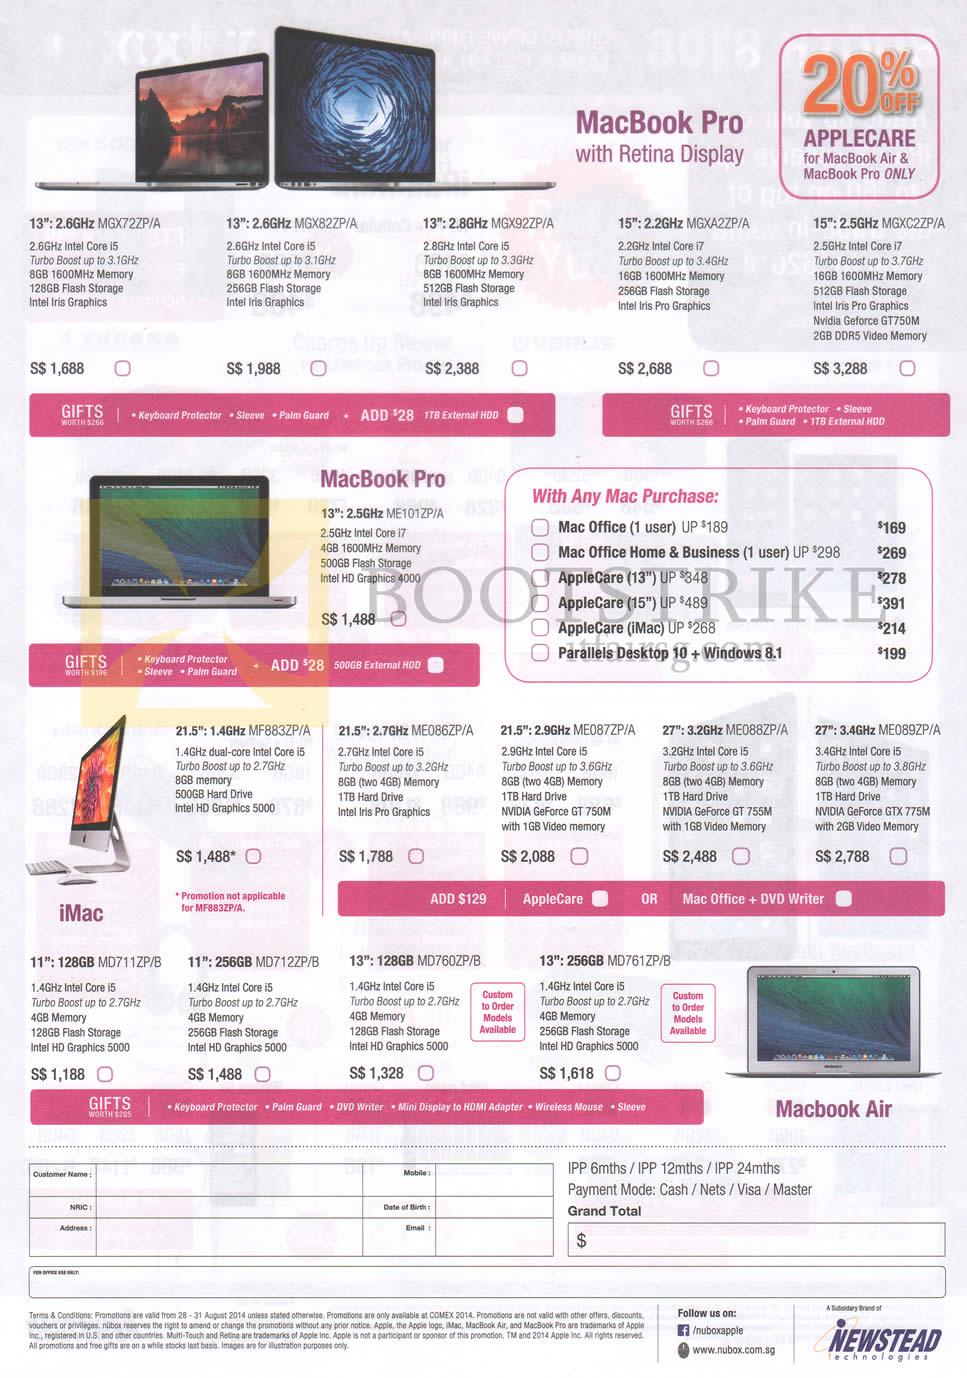 COMEX 2014 price list image brochure of Newstead Apple MacBook Pro Notebook, With Retina Display, IMac AIO Desktop PC, MacBook Air